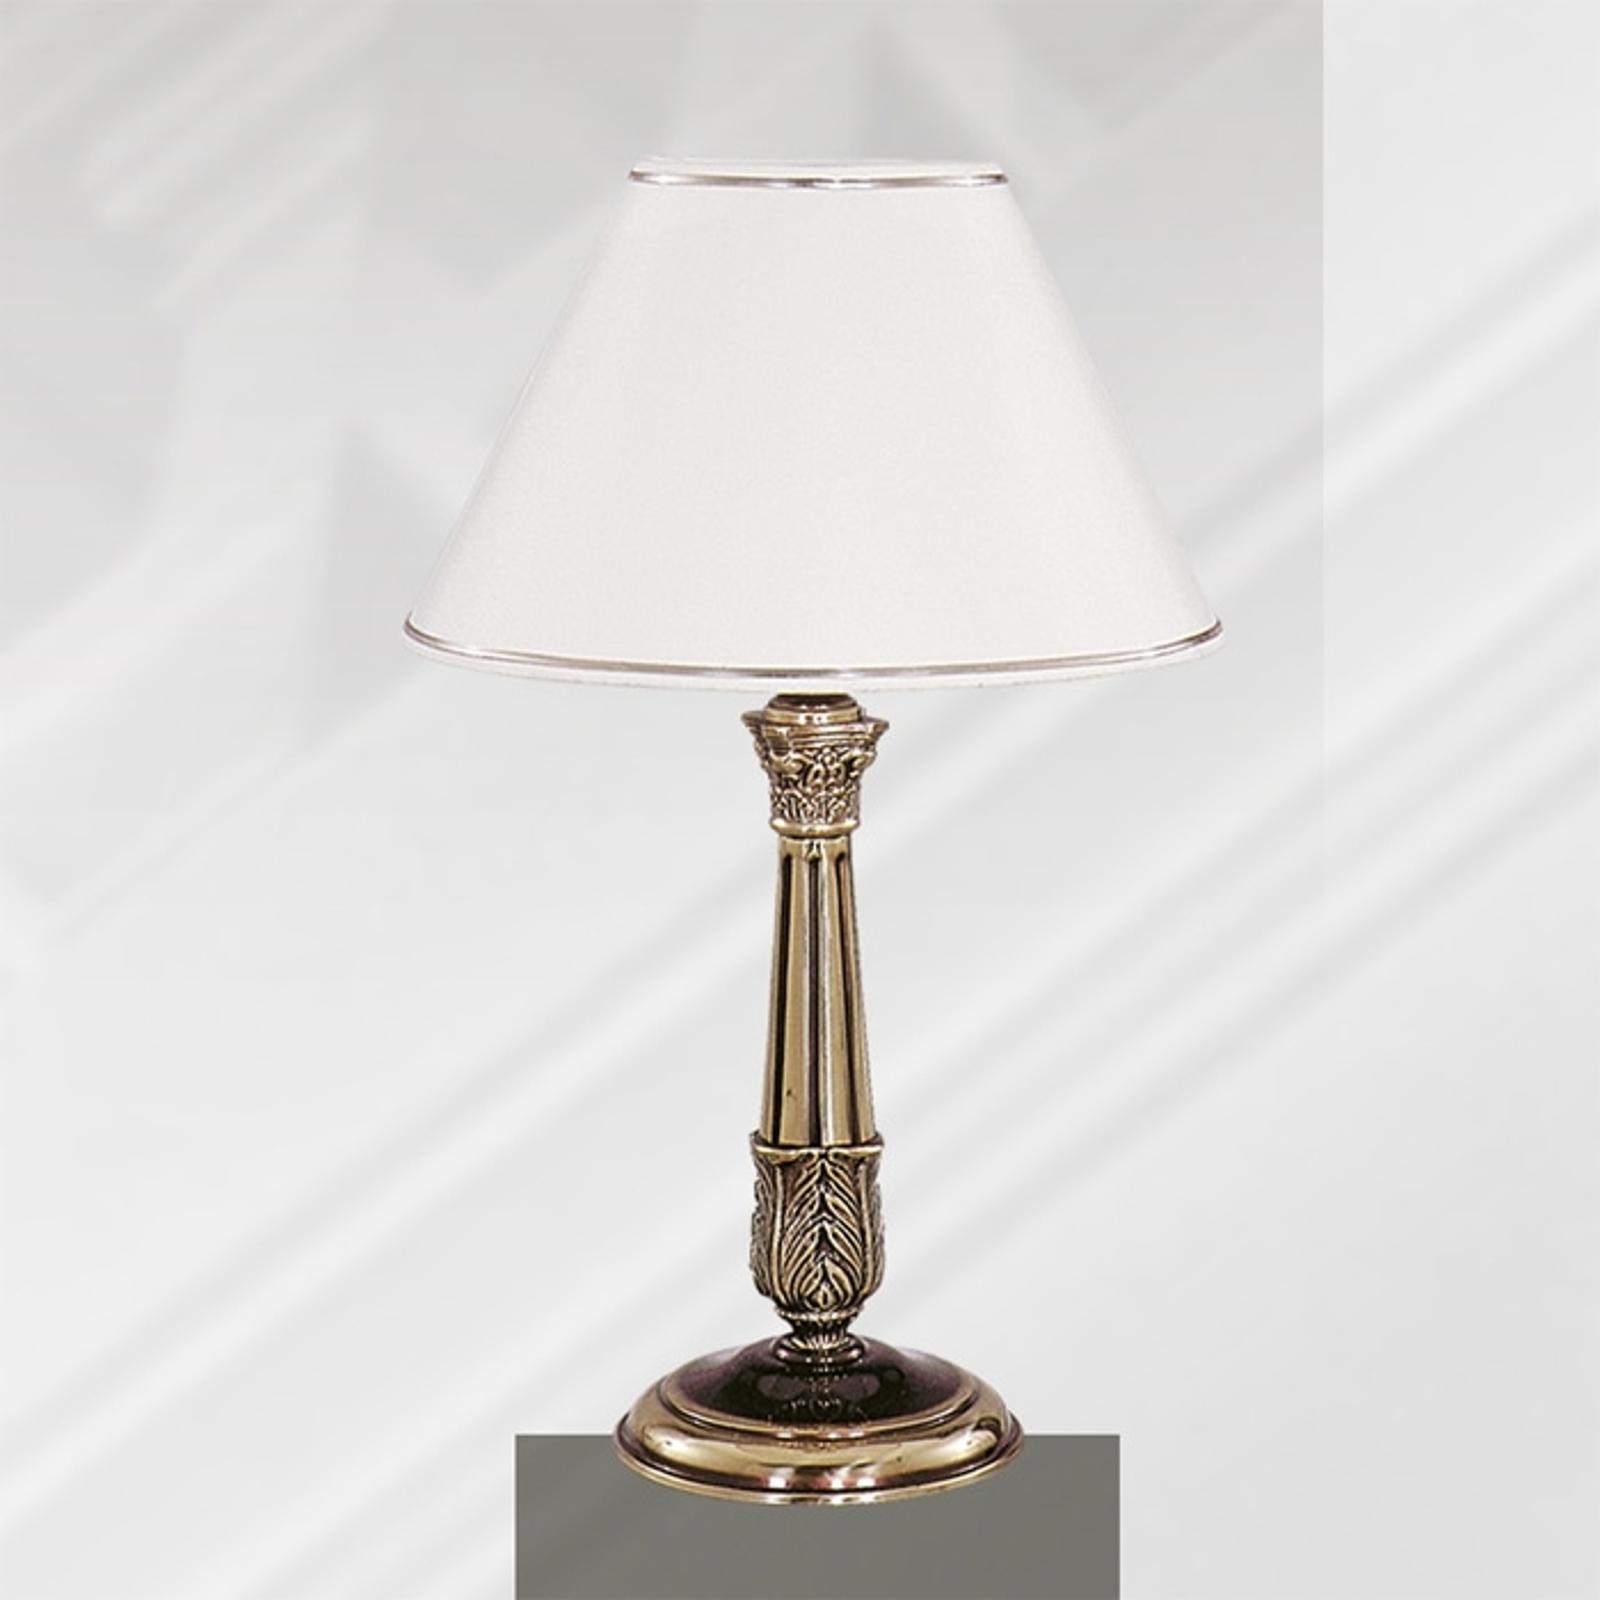 Bordlampe fra kollektionen HOLANDESAS